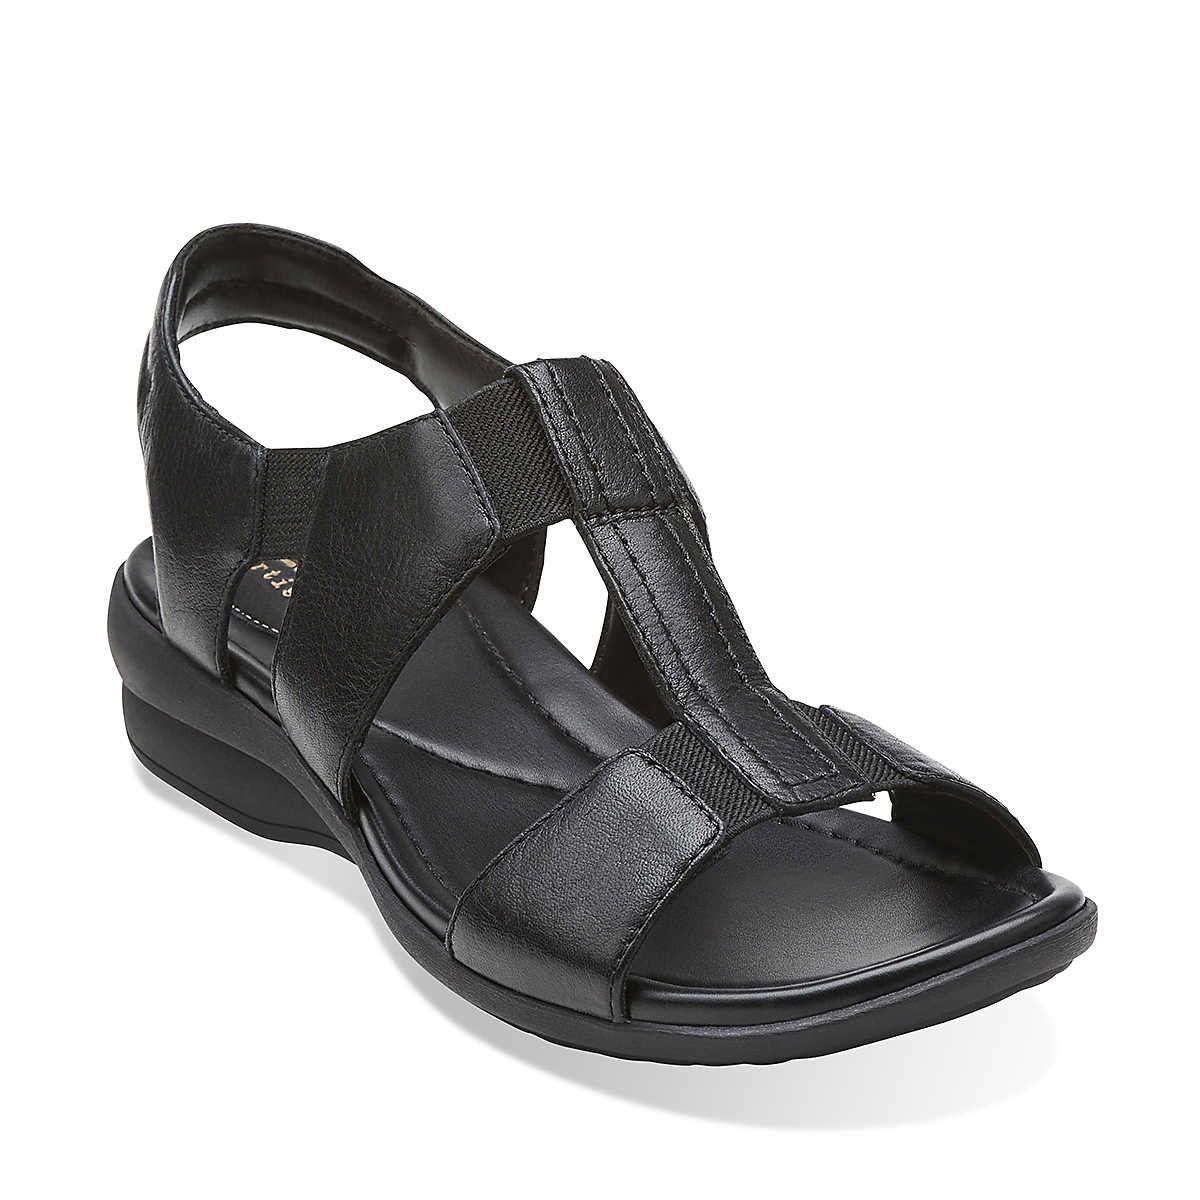 Womens Sandals Clarks Reid Delmar Black Leather